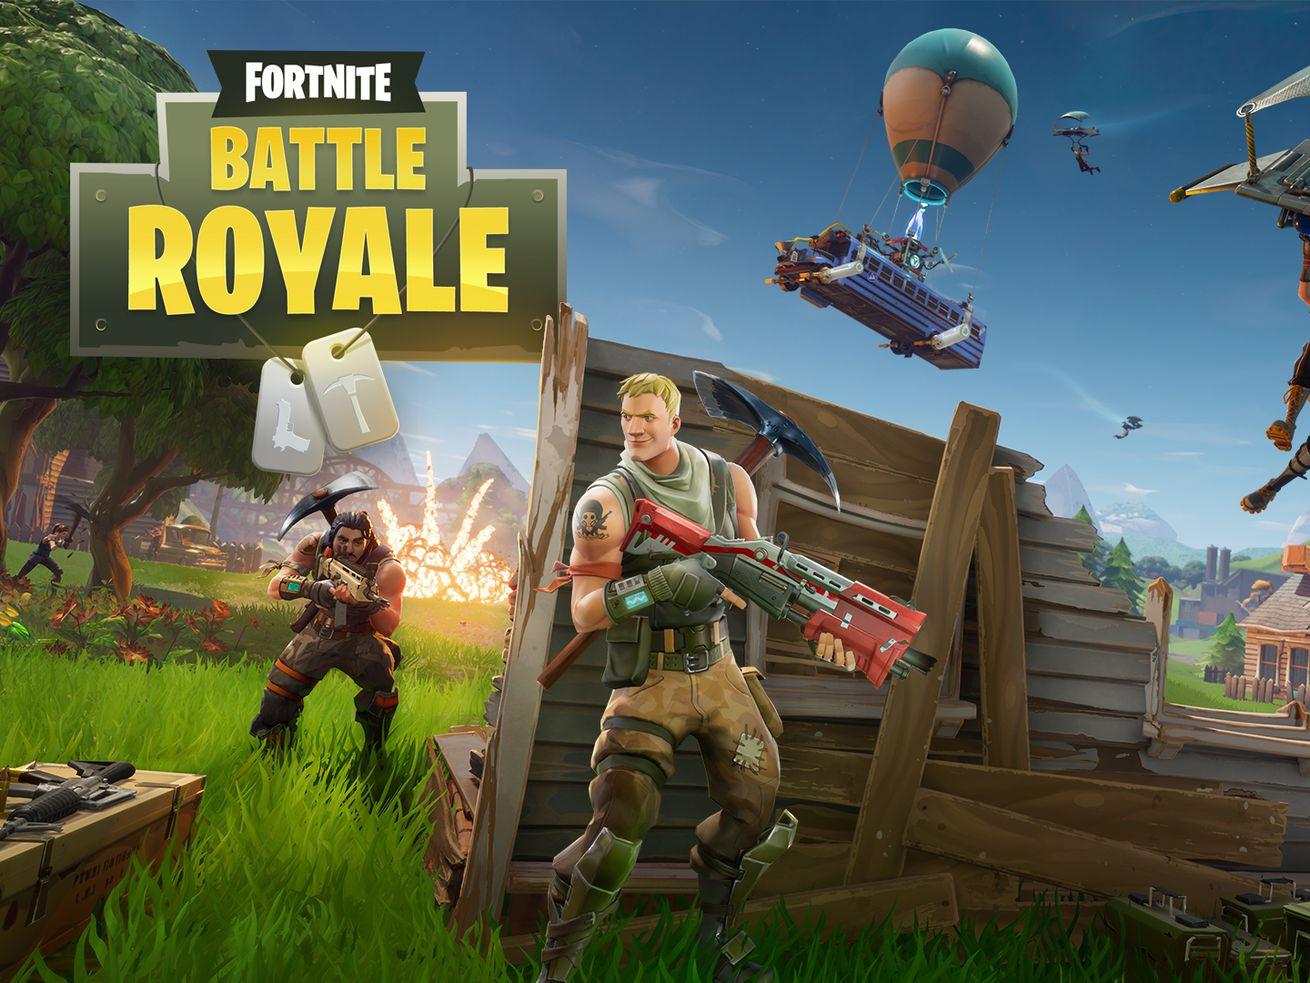 A screenshot of Fortnite Battle Royale